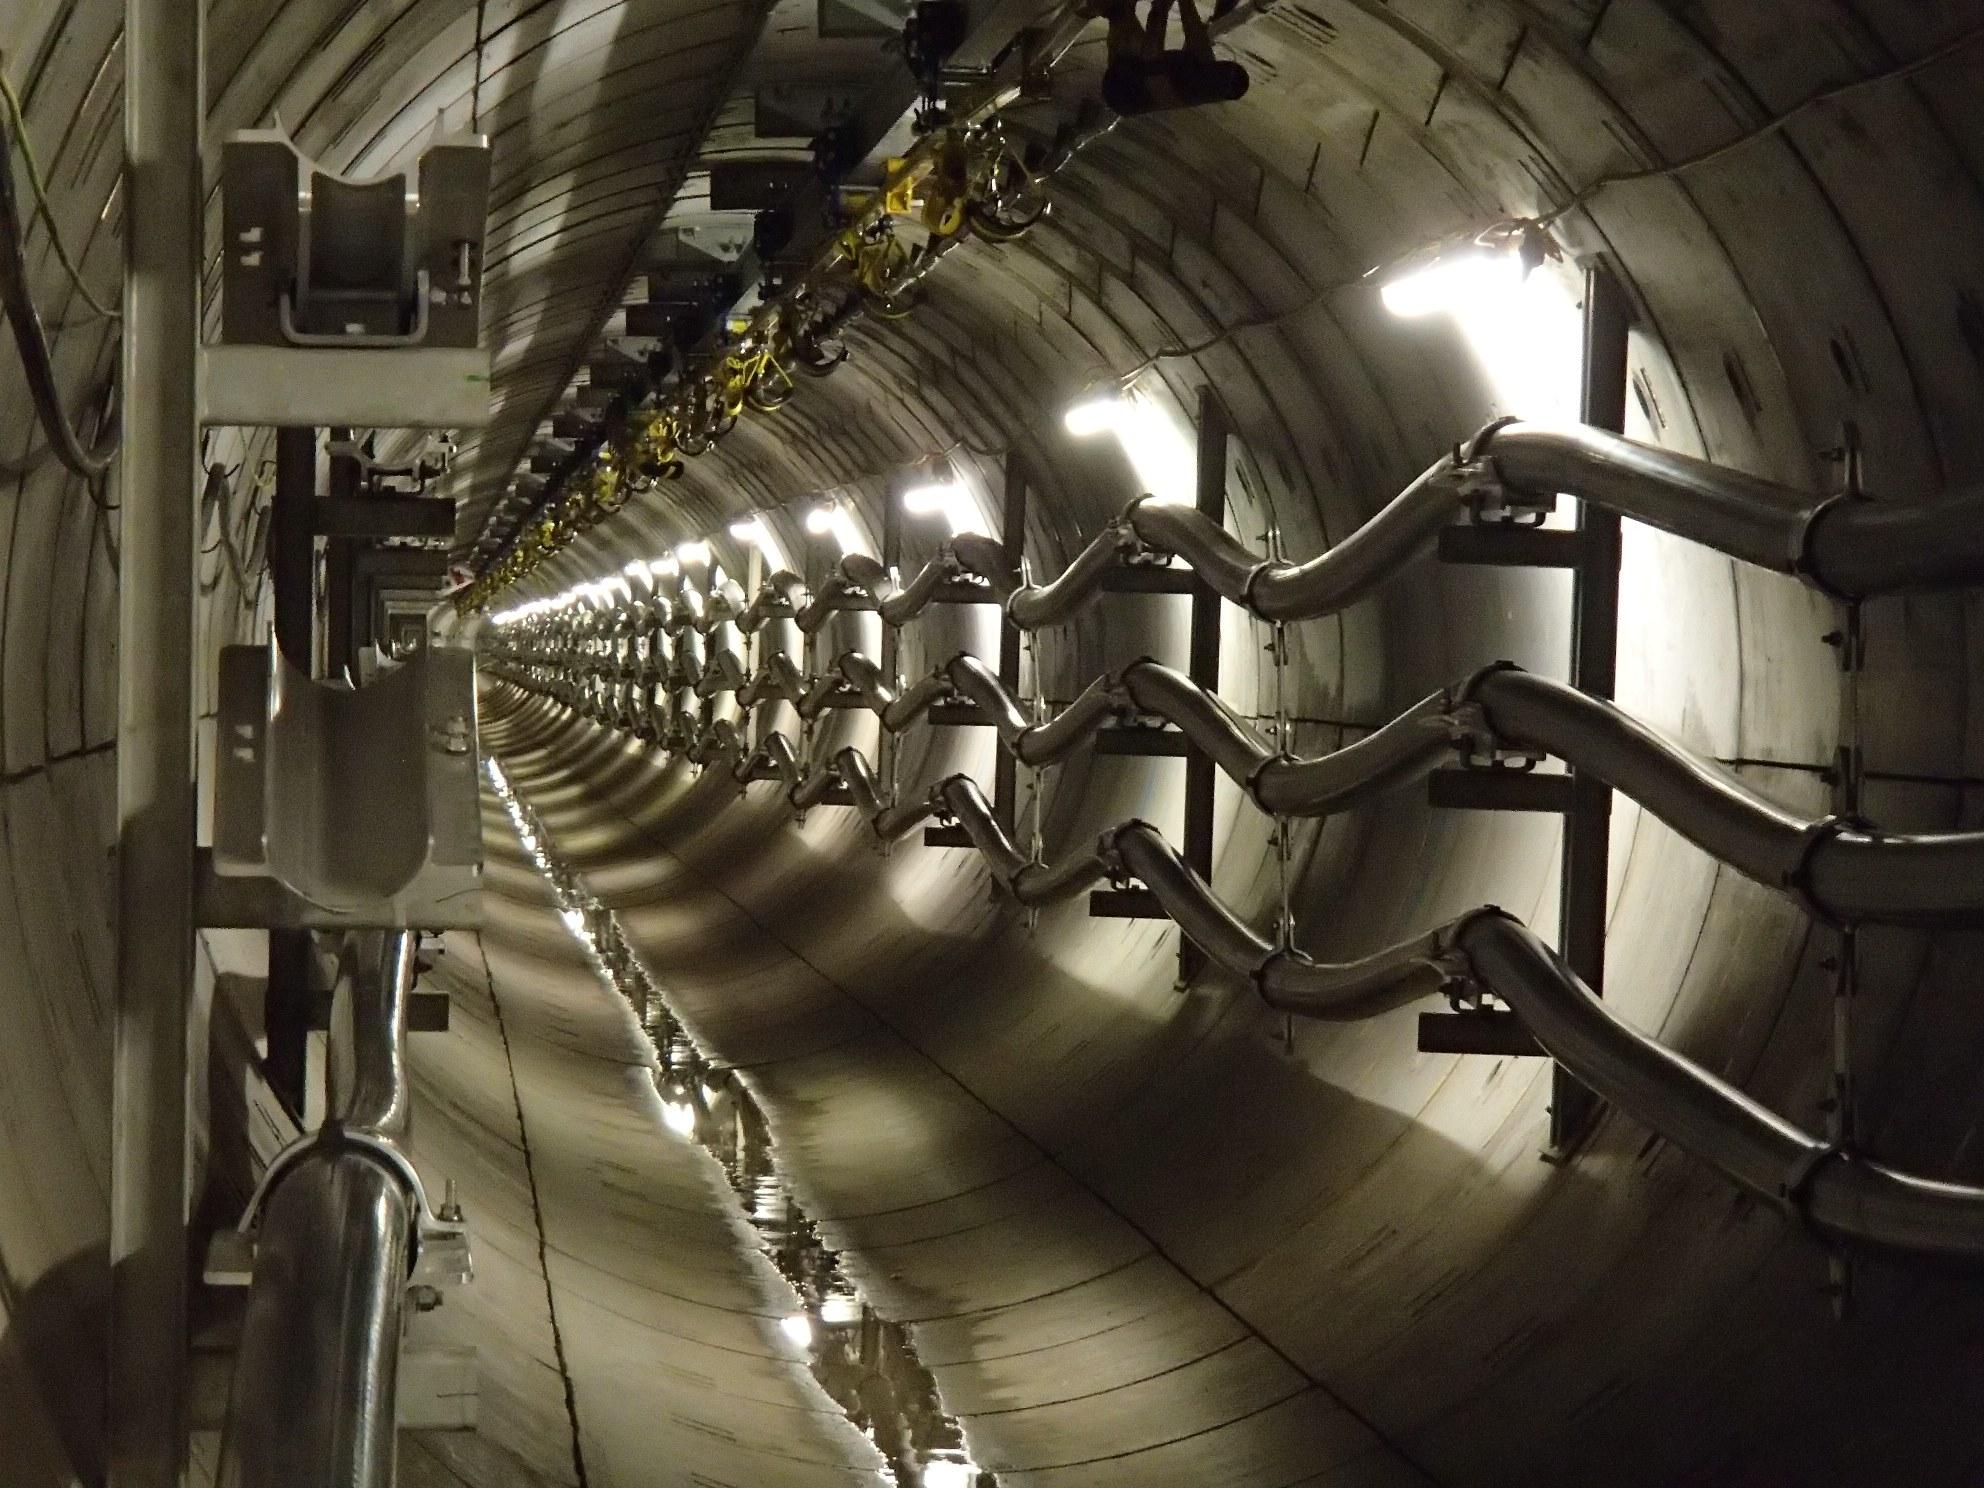 34831_34831_London-Power-Tunnels-installation-SMALL.jpg